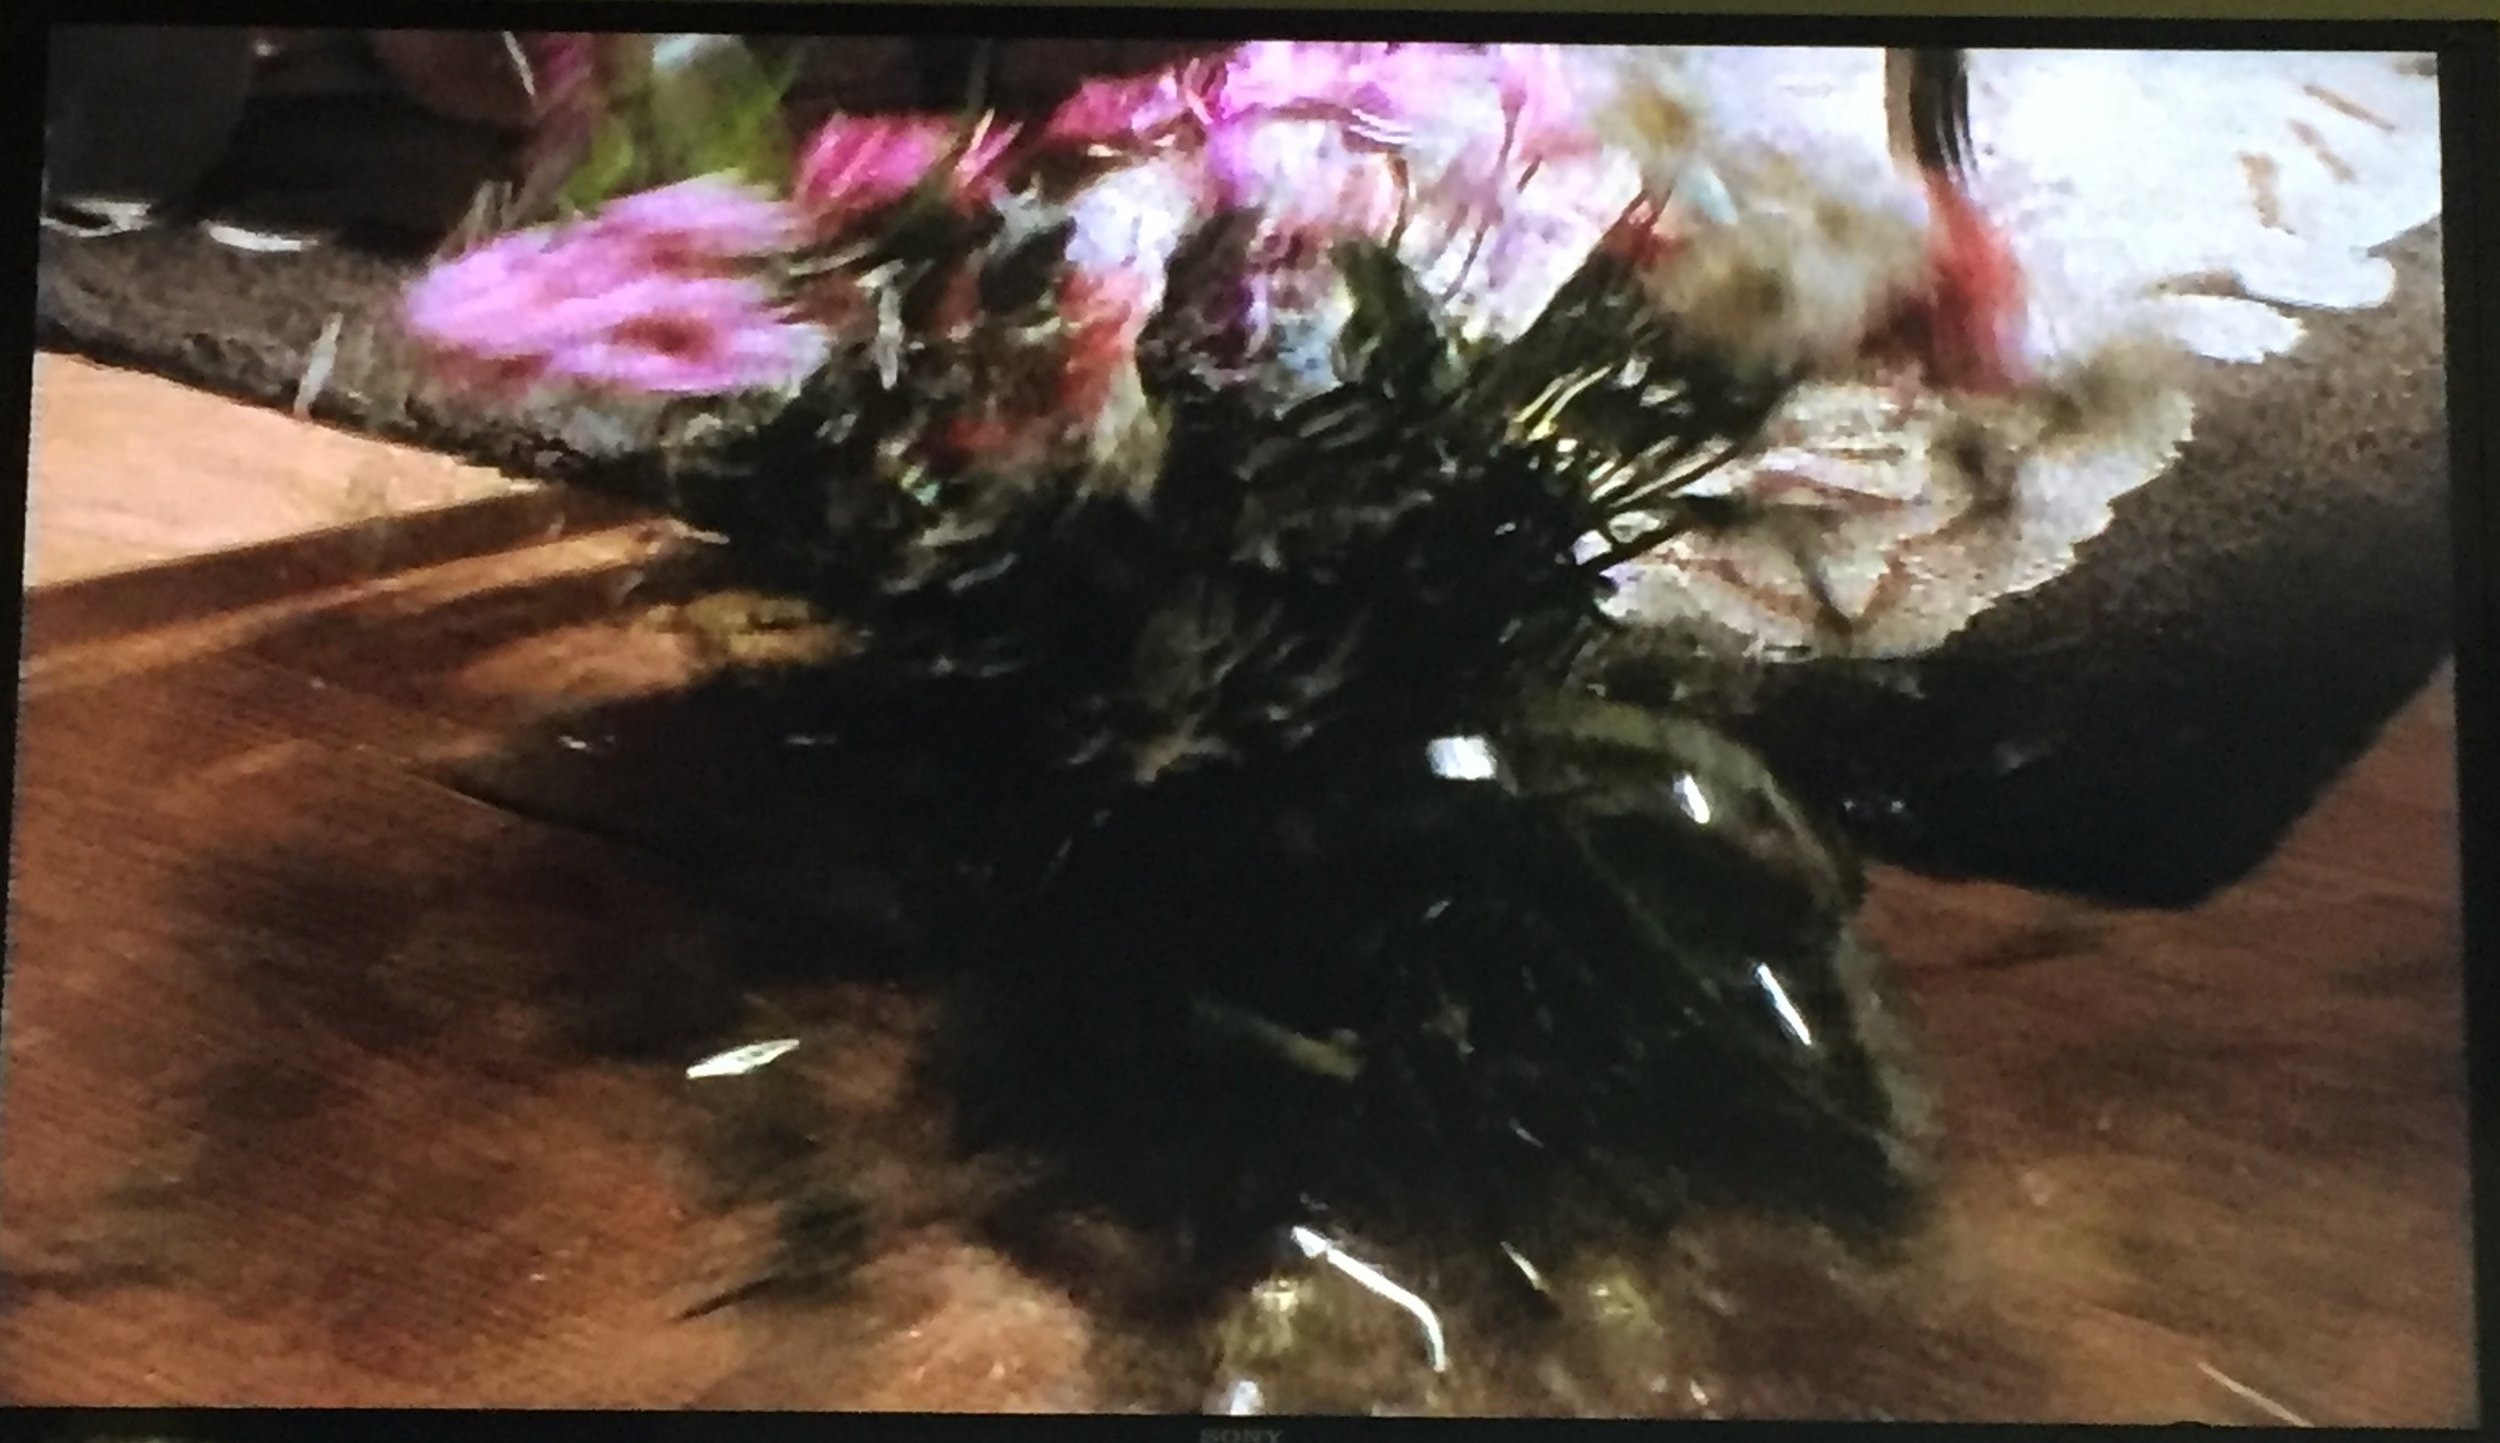 The vase as it crashes.